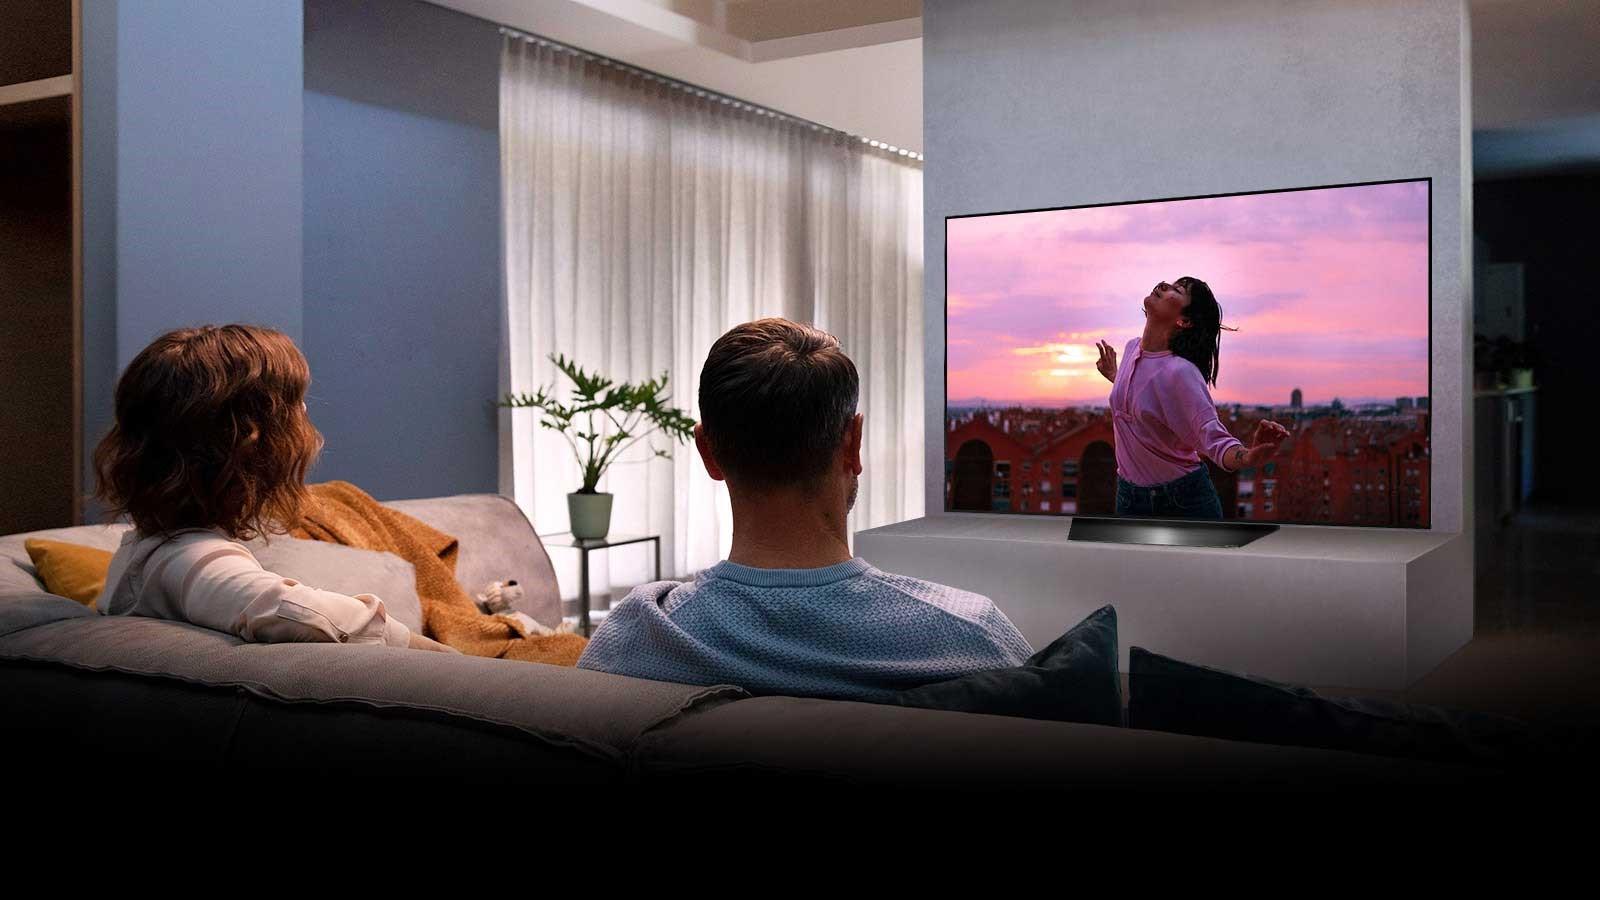 LG BX OLED best cheap OLED TV